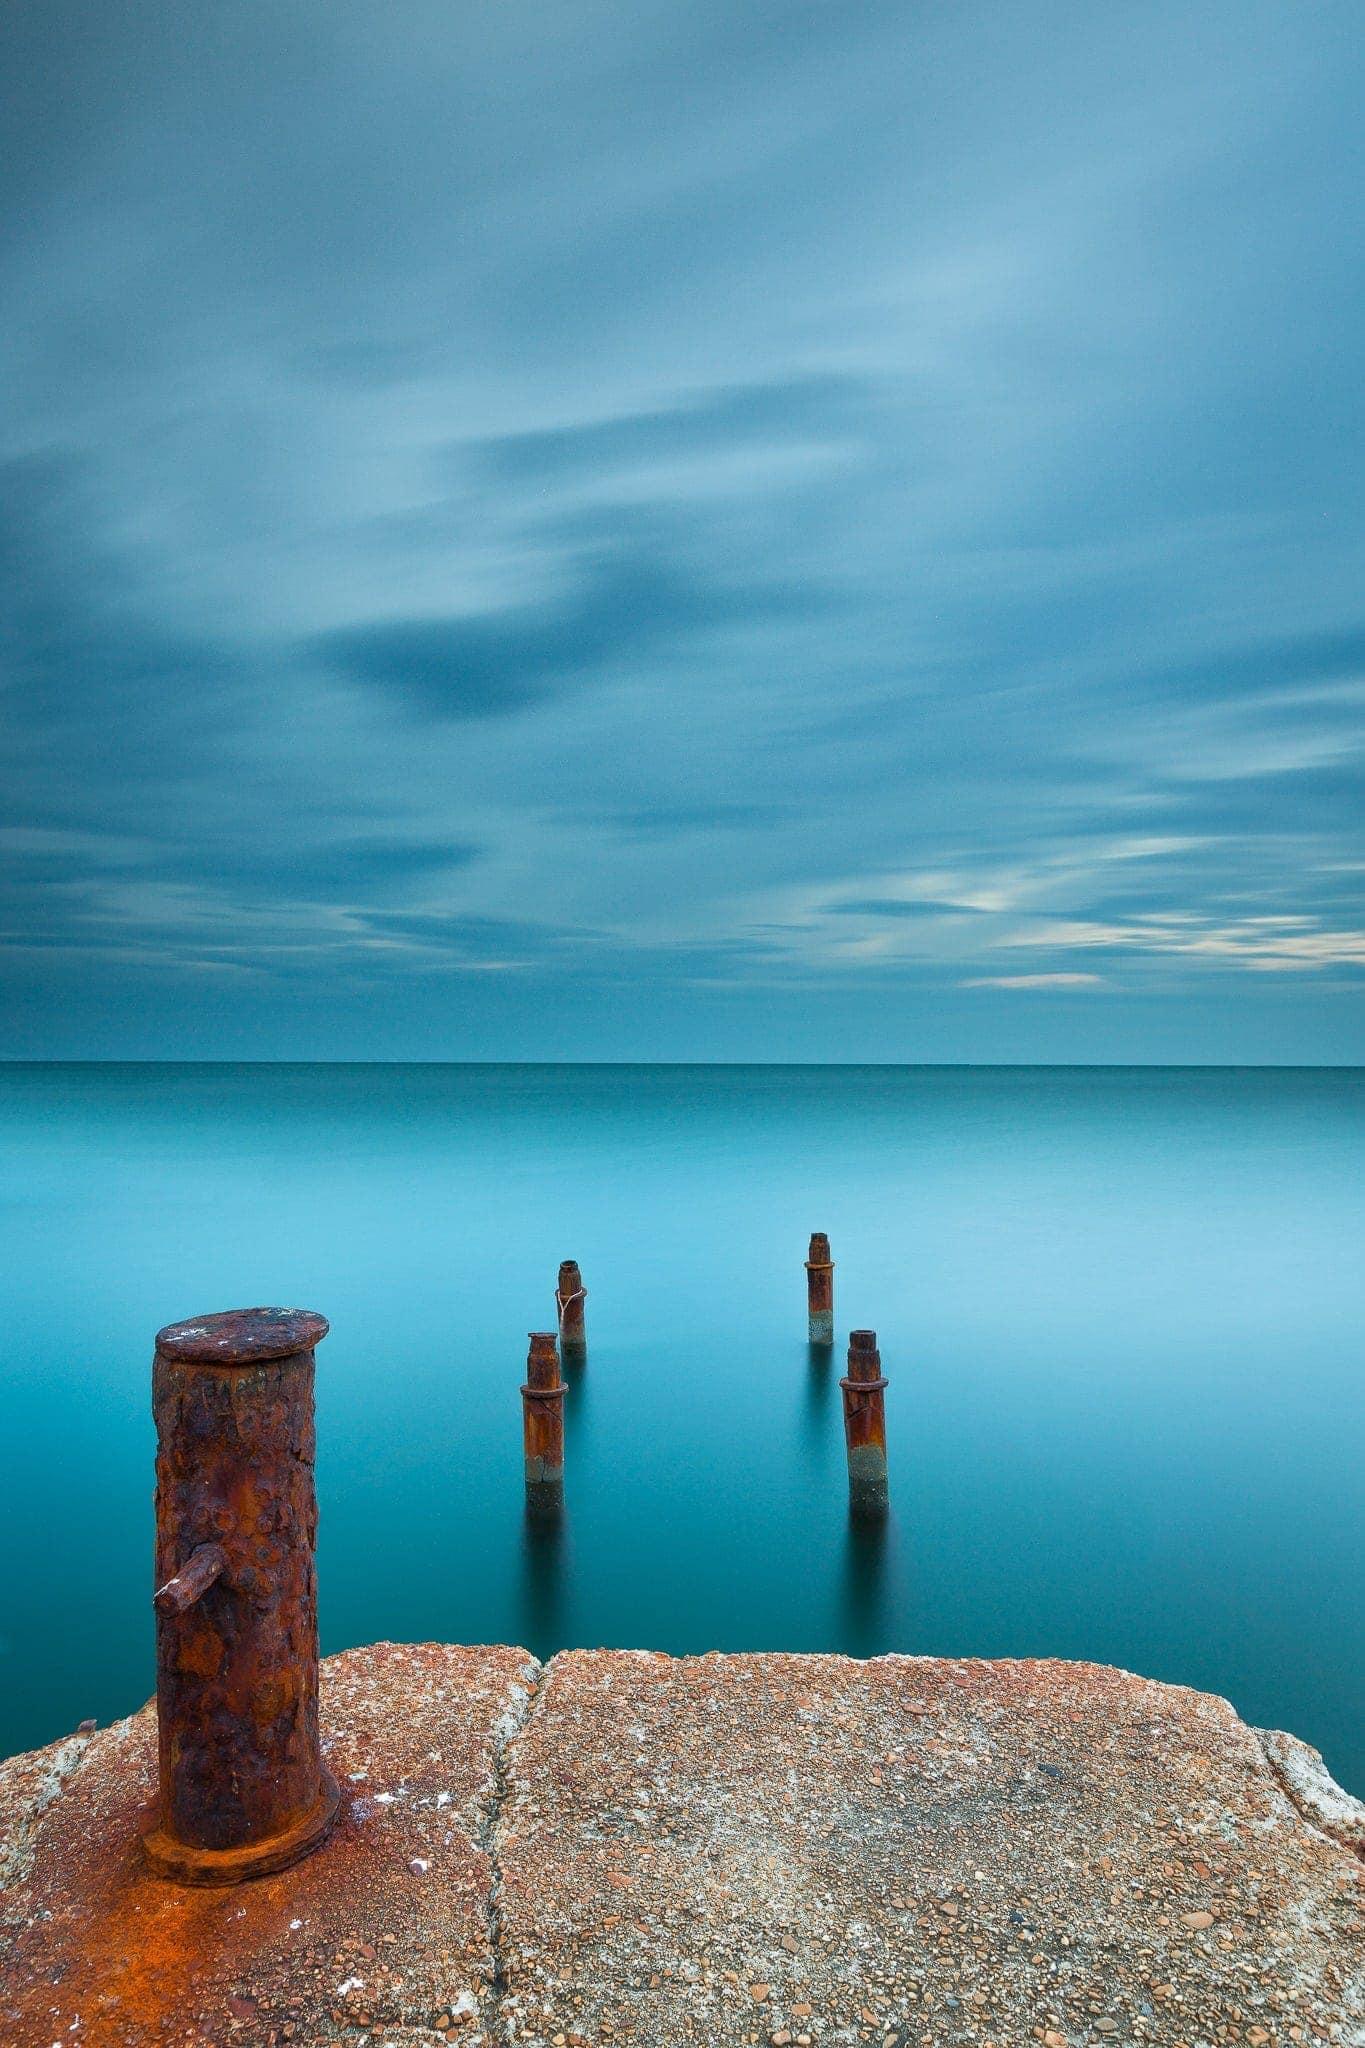 Francesco Gola Seascape Landscape Photography Long Exposure Lerici Old Pier Rusty Italy